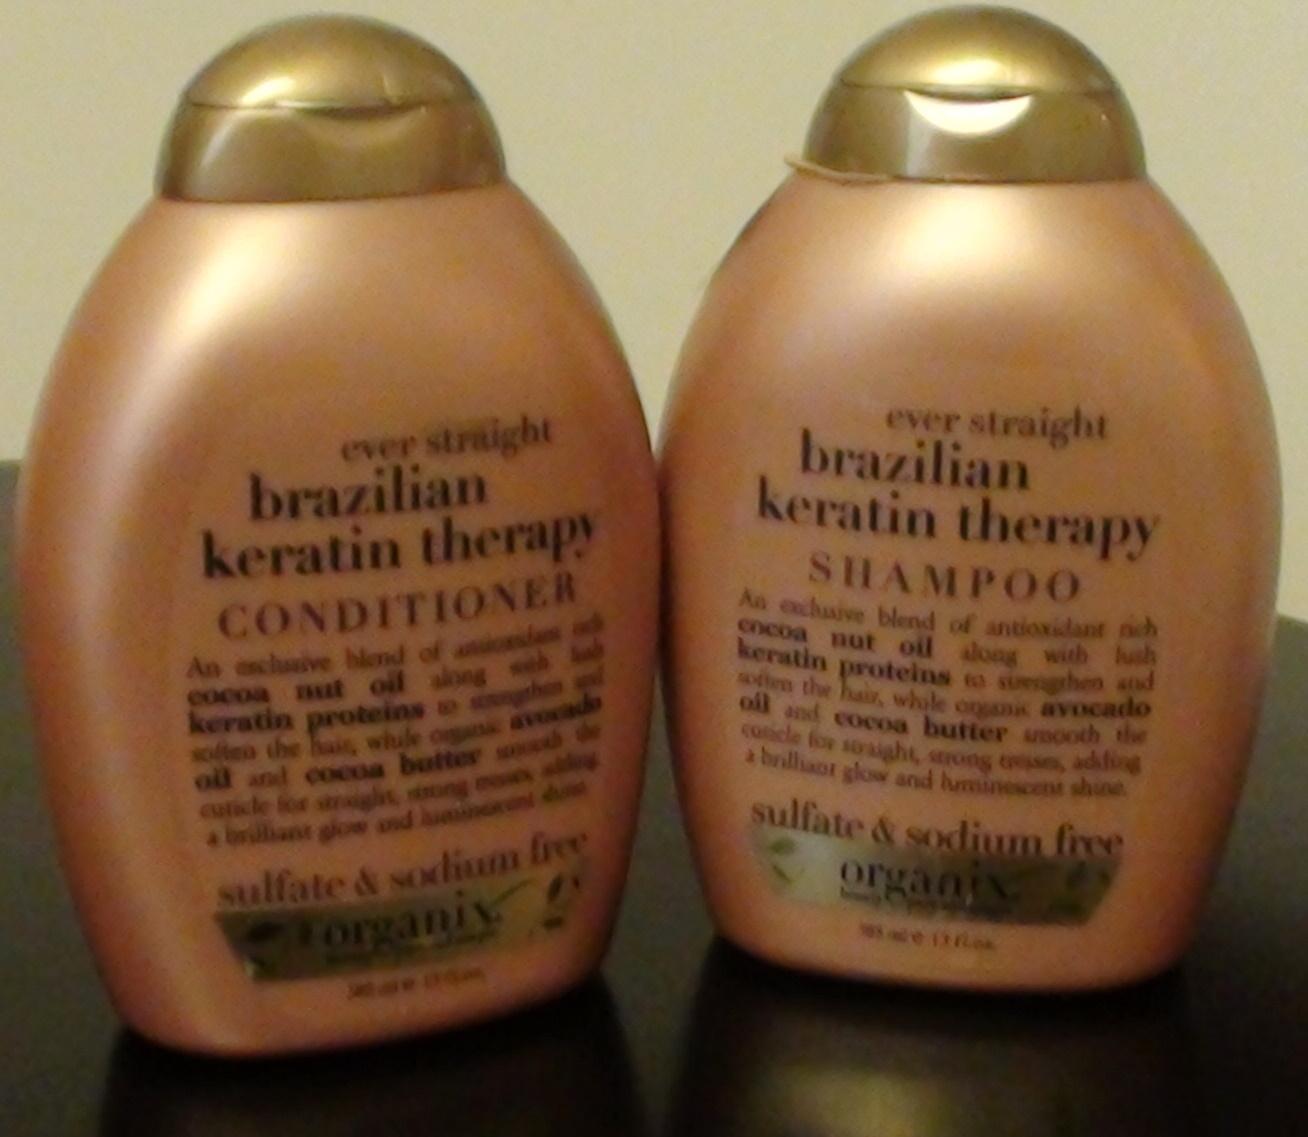 Thestylesupreme Organix Brazilian Keratin Therapy Shampoo